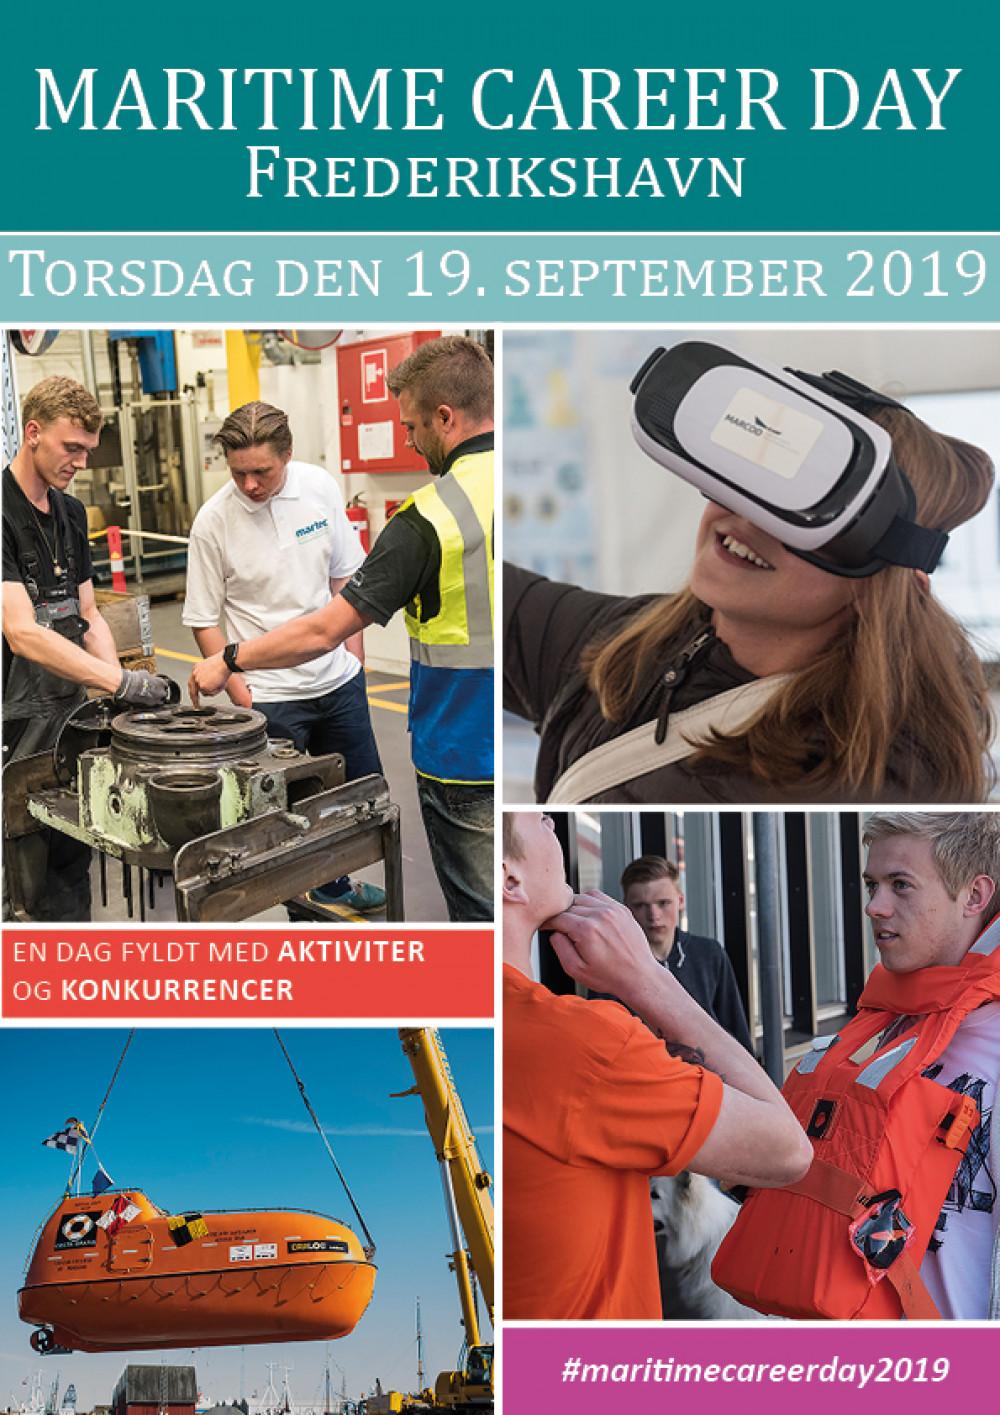 Maritime-Career-2019-A4_b5c45d1258839dbd77c8ea0e9a94f4e9.jpg